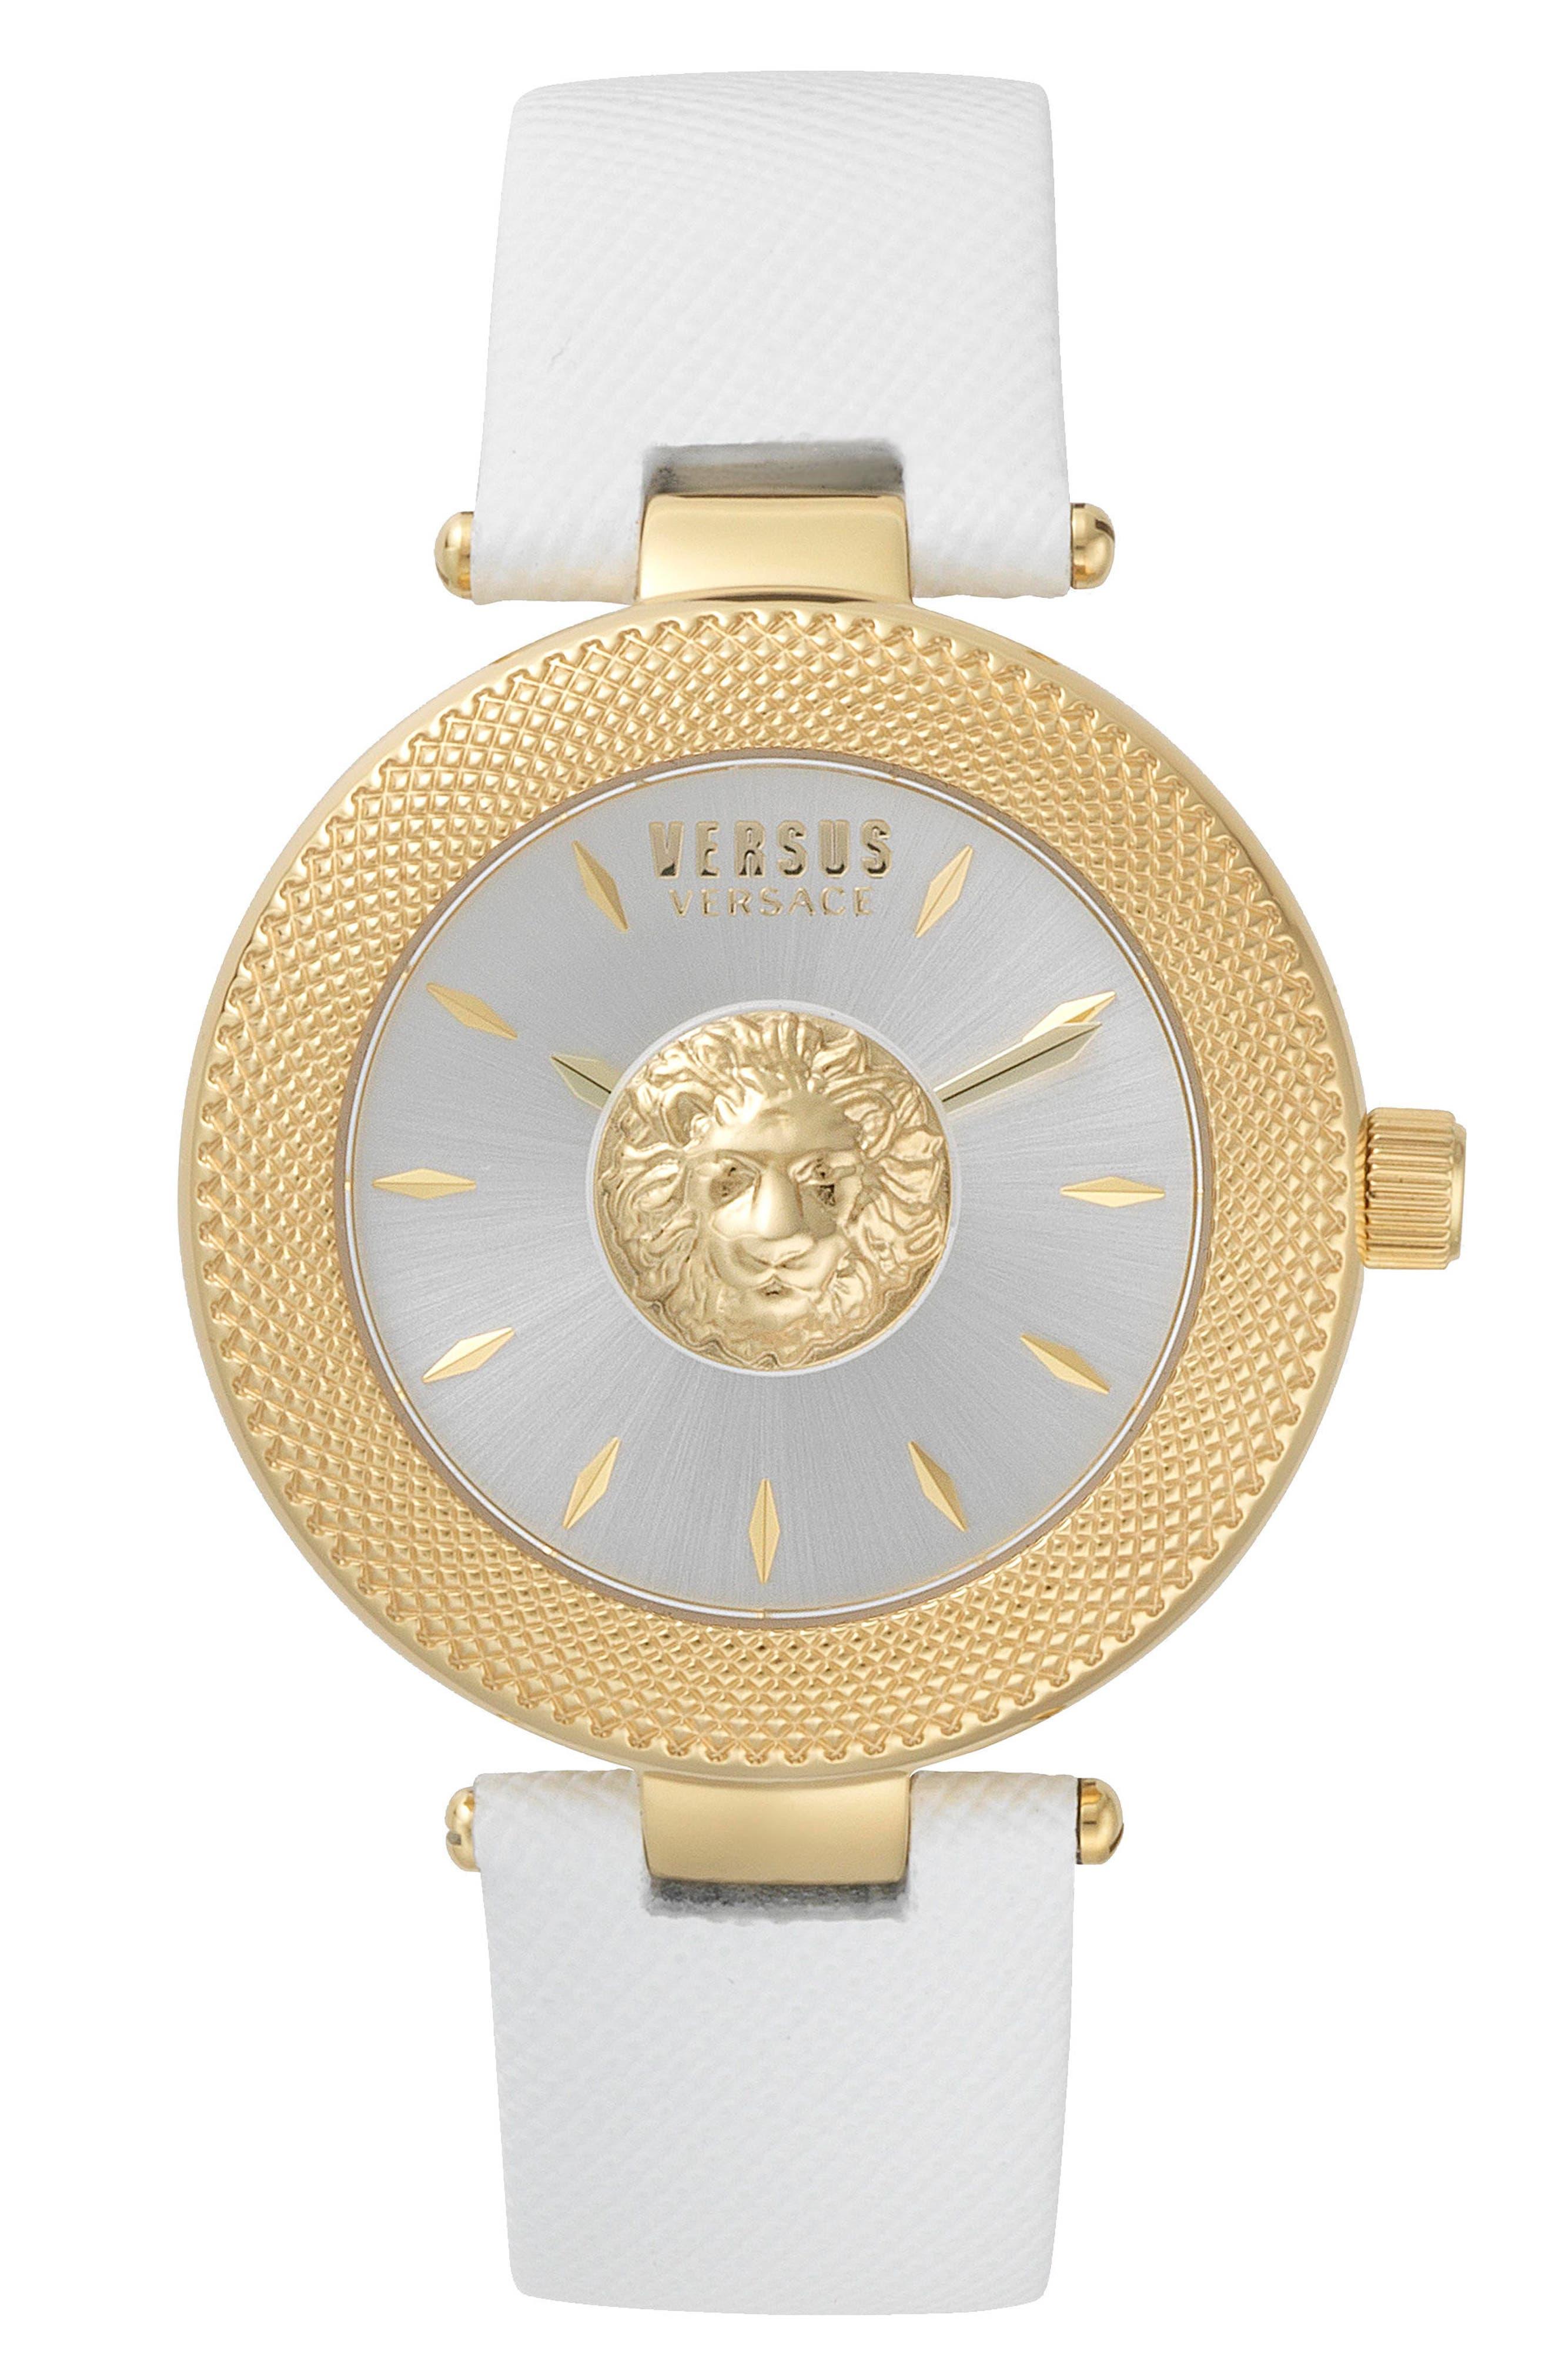 Main Image - VERSUS by Versace Brick Lane Leather Strap Watch, 40mm